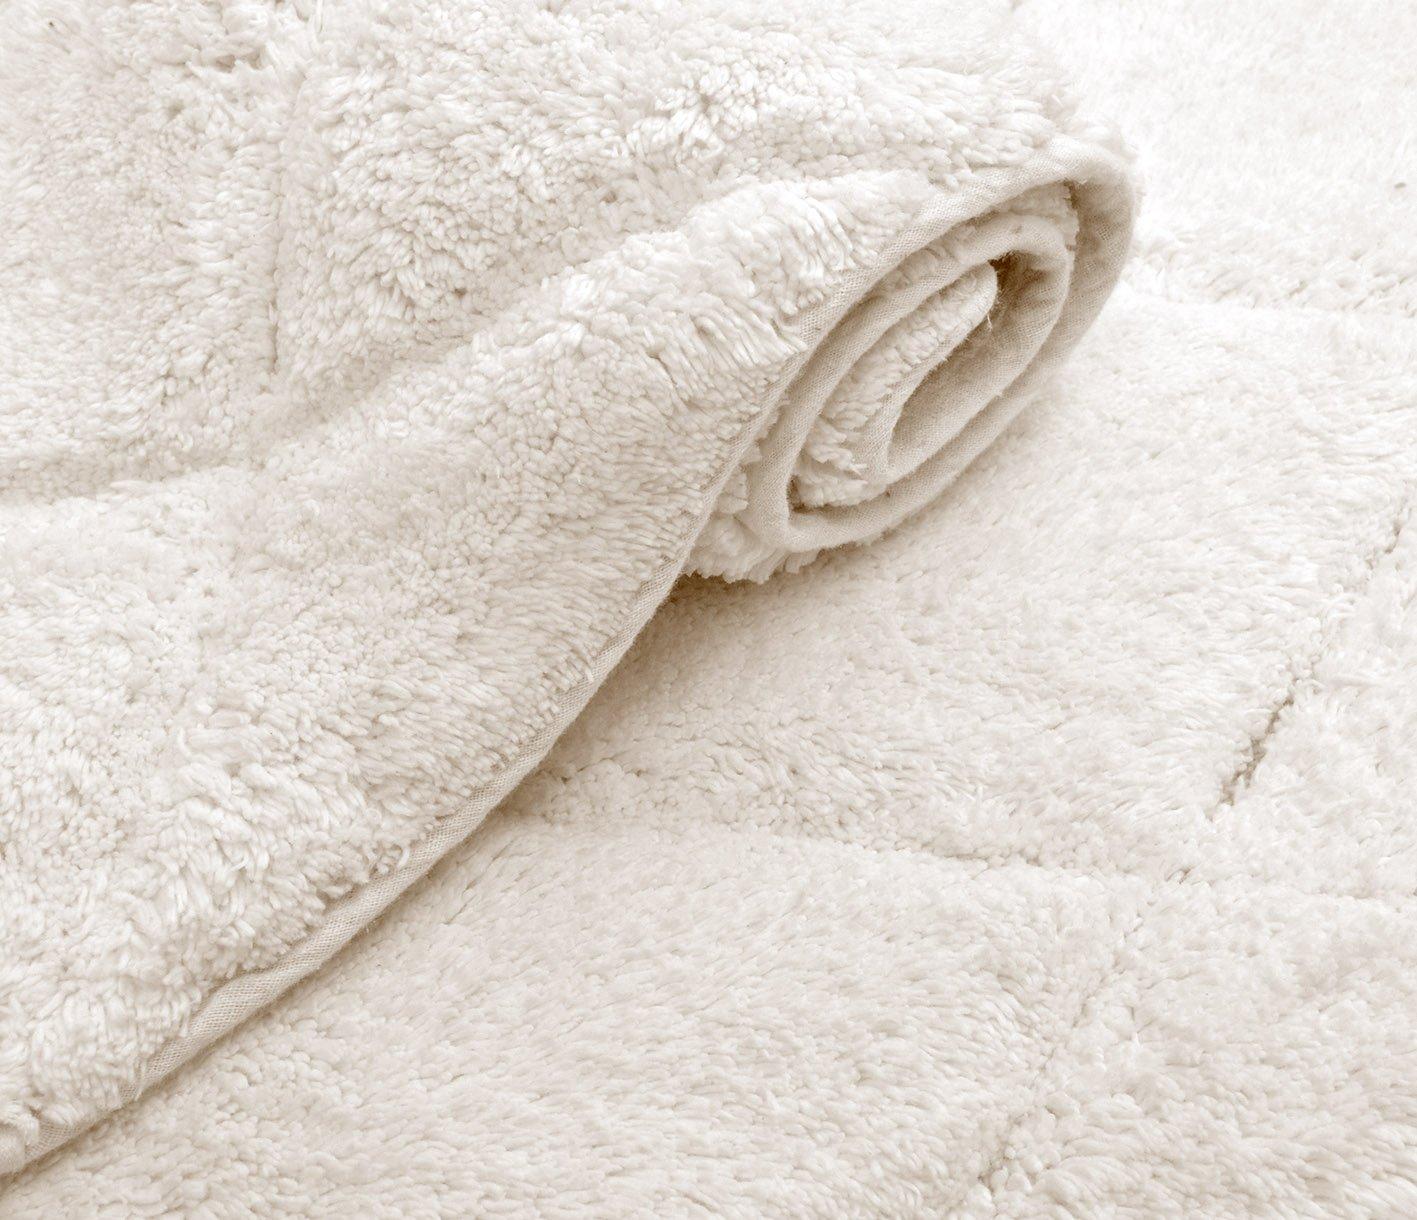 Ivory, Cotton Arena Value Homezz Stock Bath Rugs 21 x 34//17 x 24 Bathroom Mats